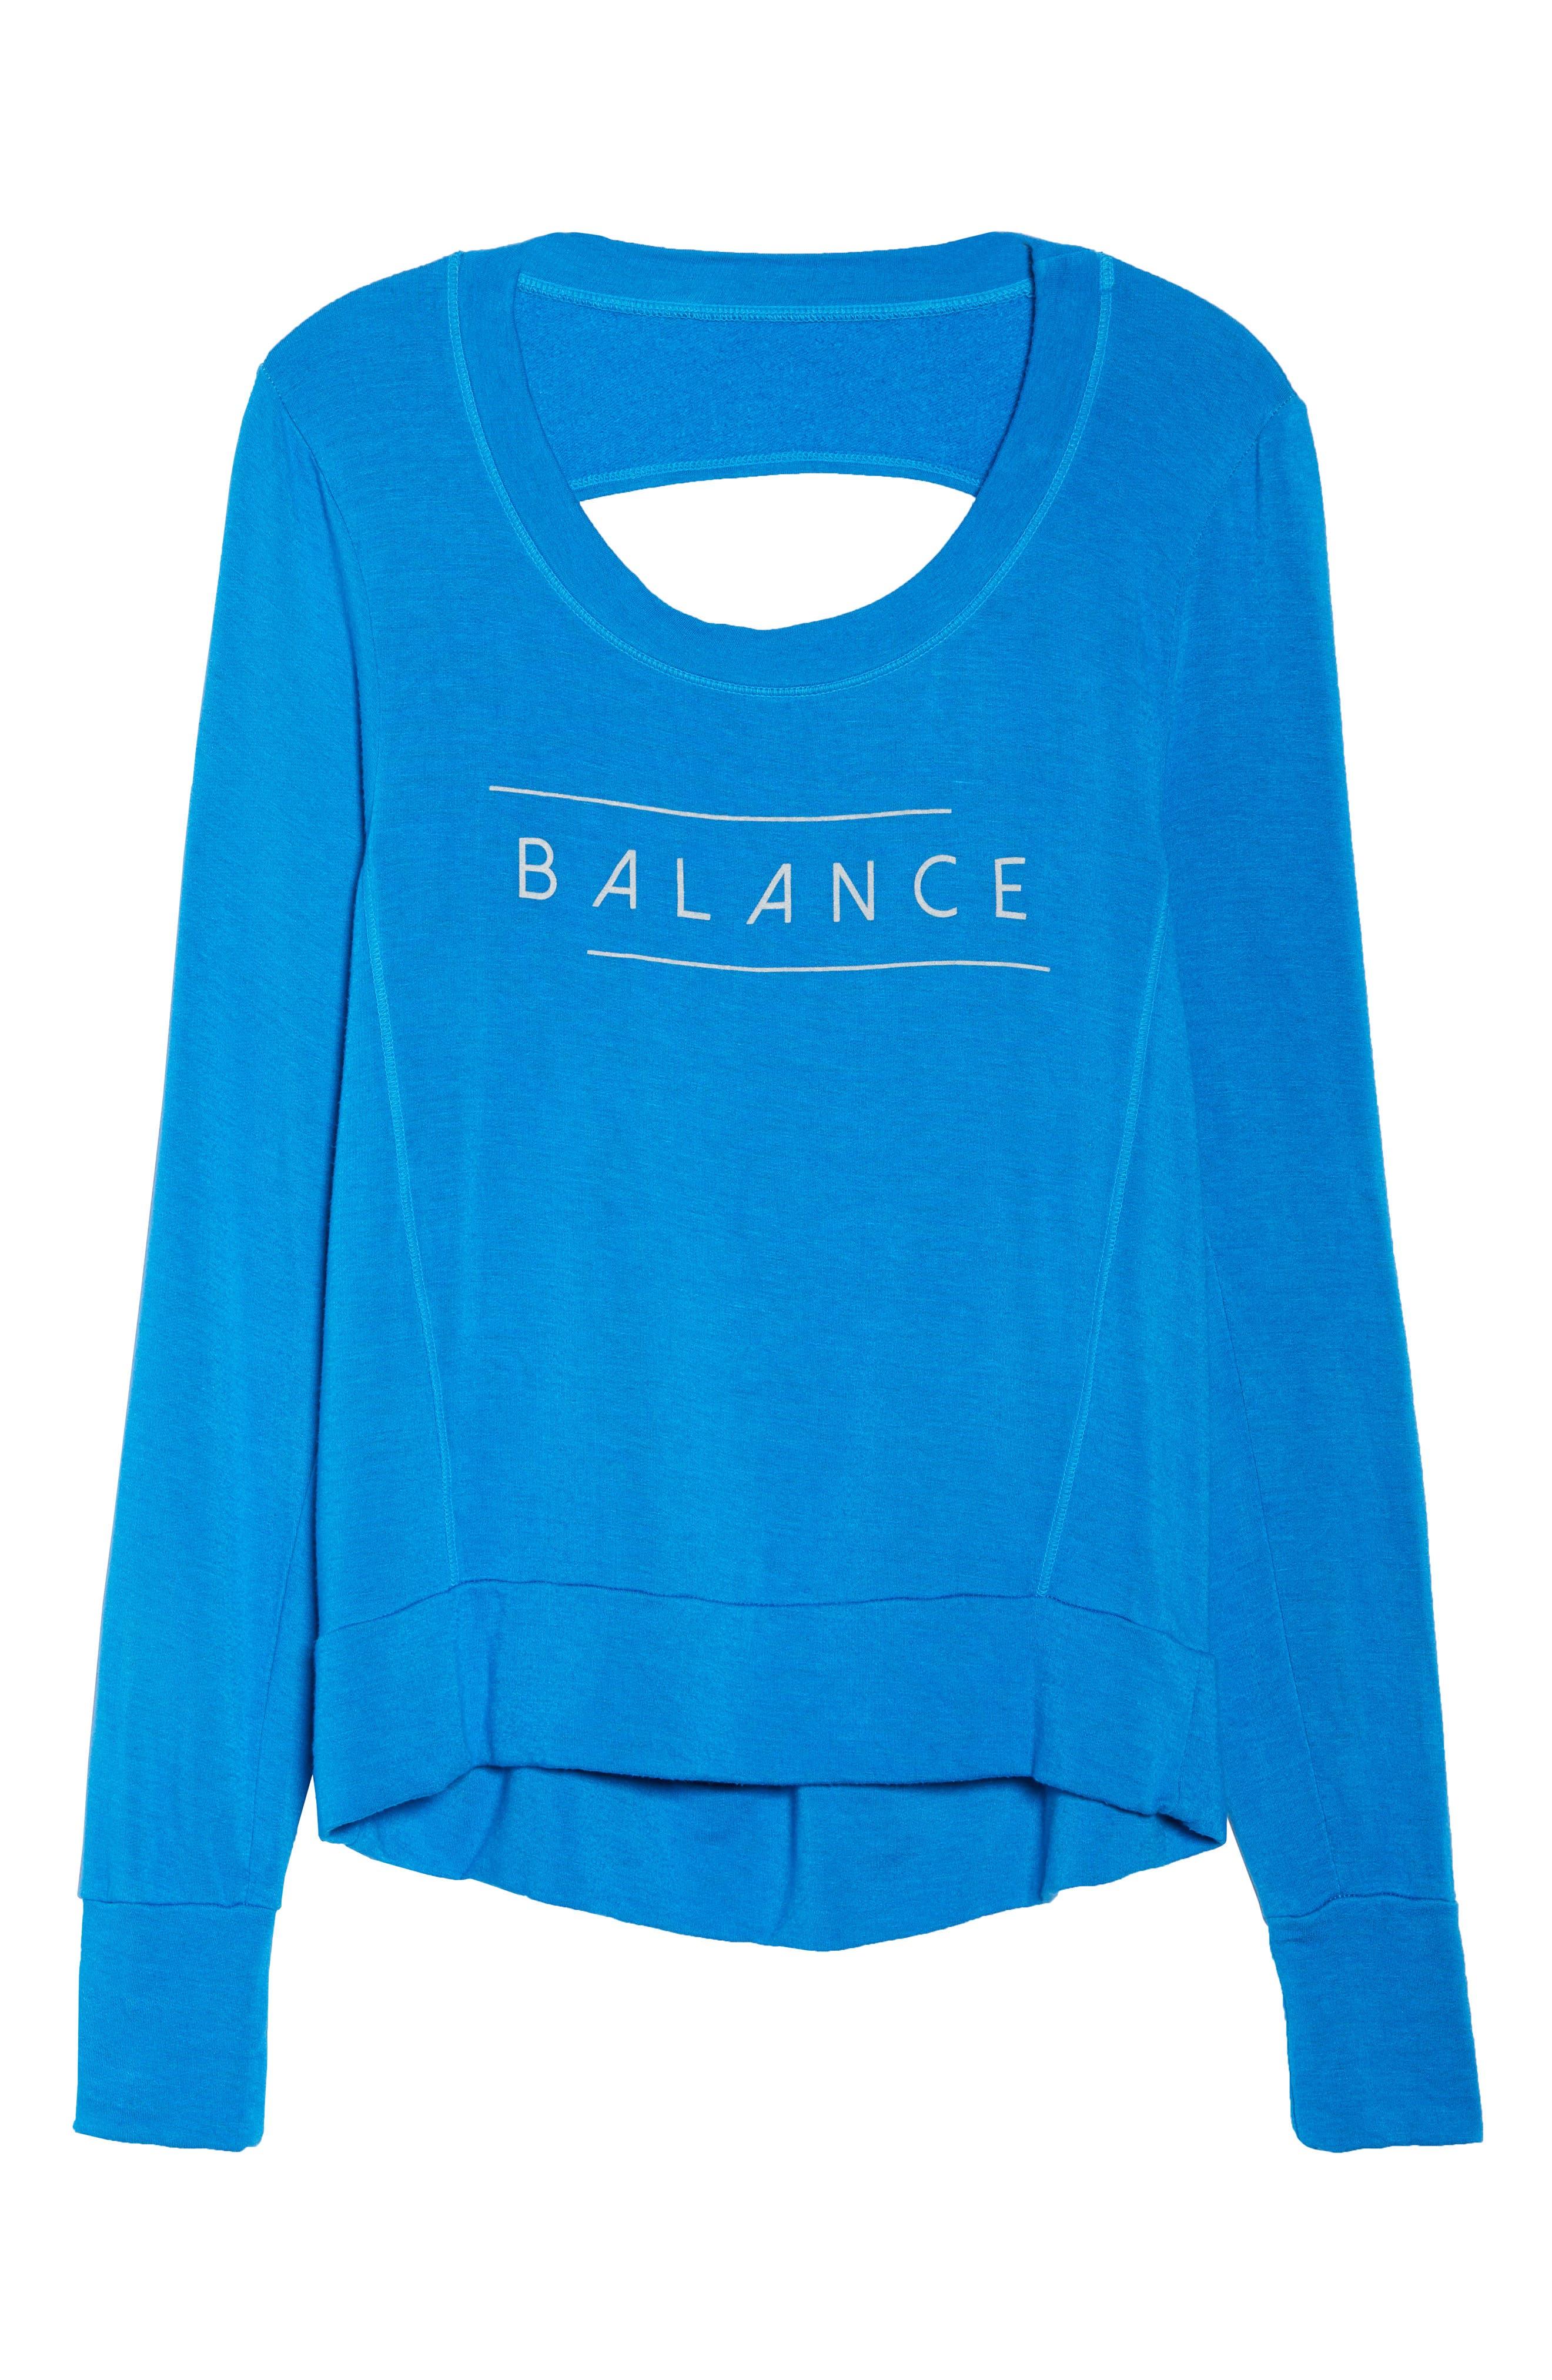 Jules Balance Sweatshirt,                             Alternate thumbnail 7, color,                             AZURE